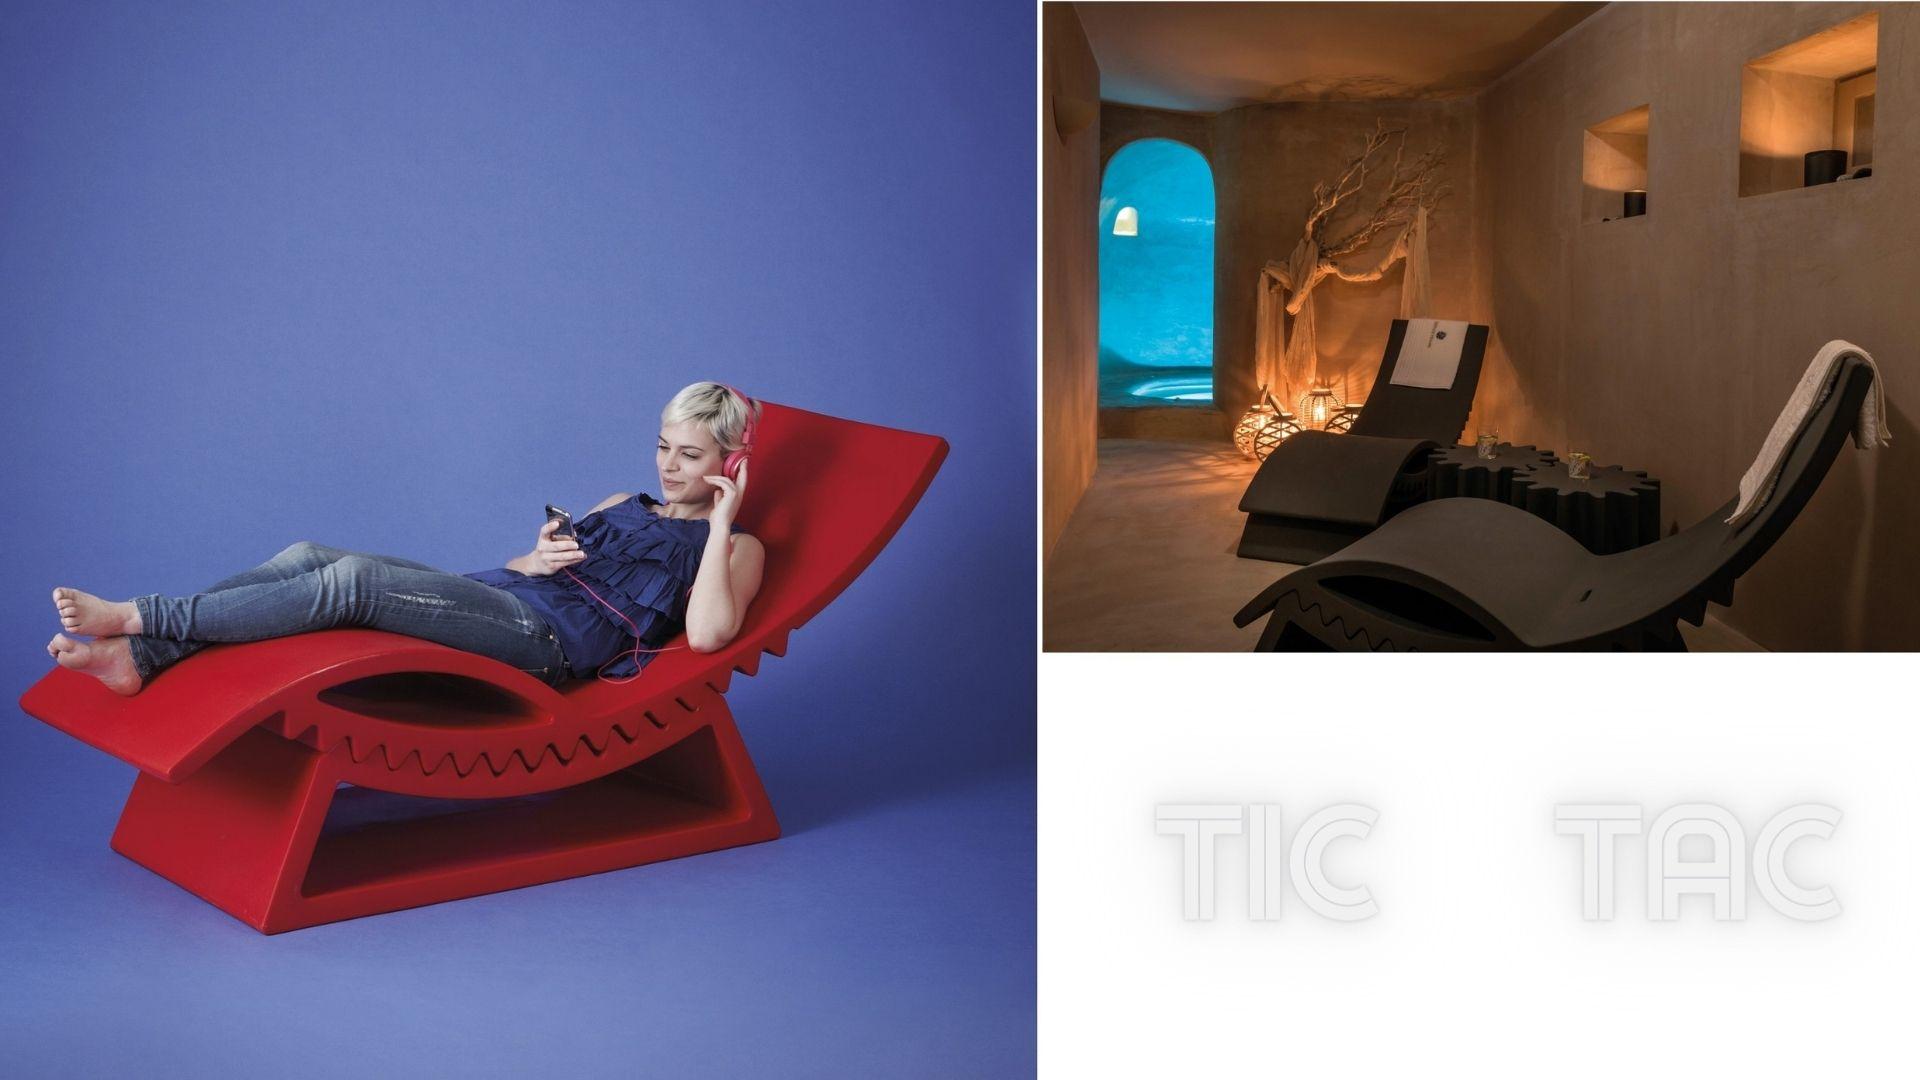 tic-tac-spa-chaise